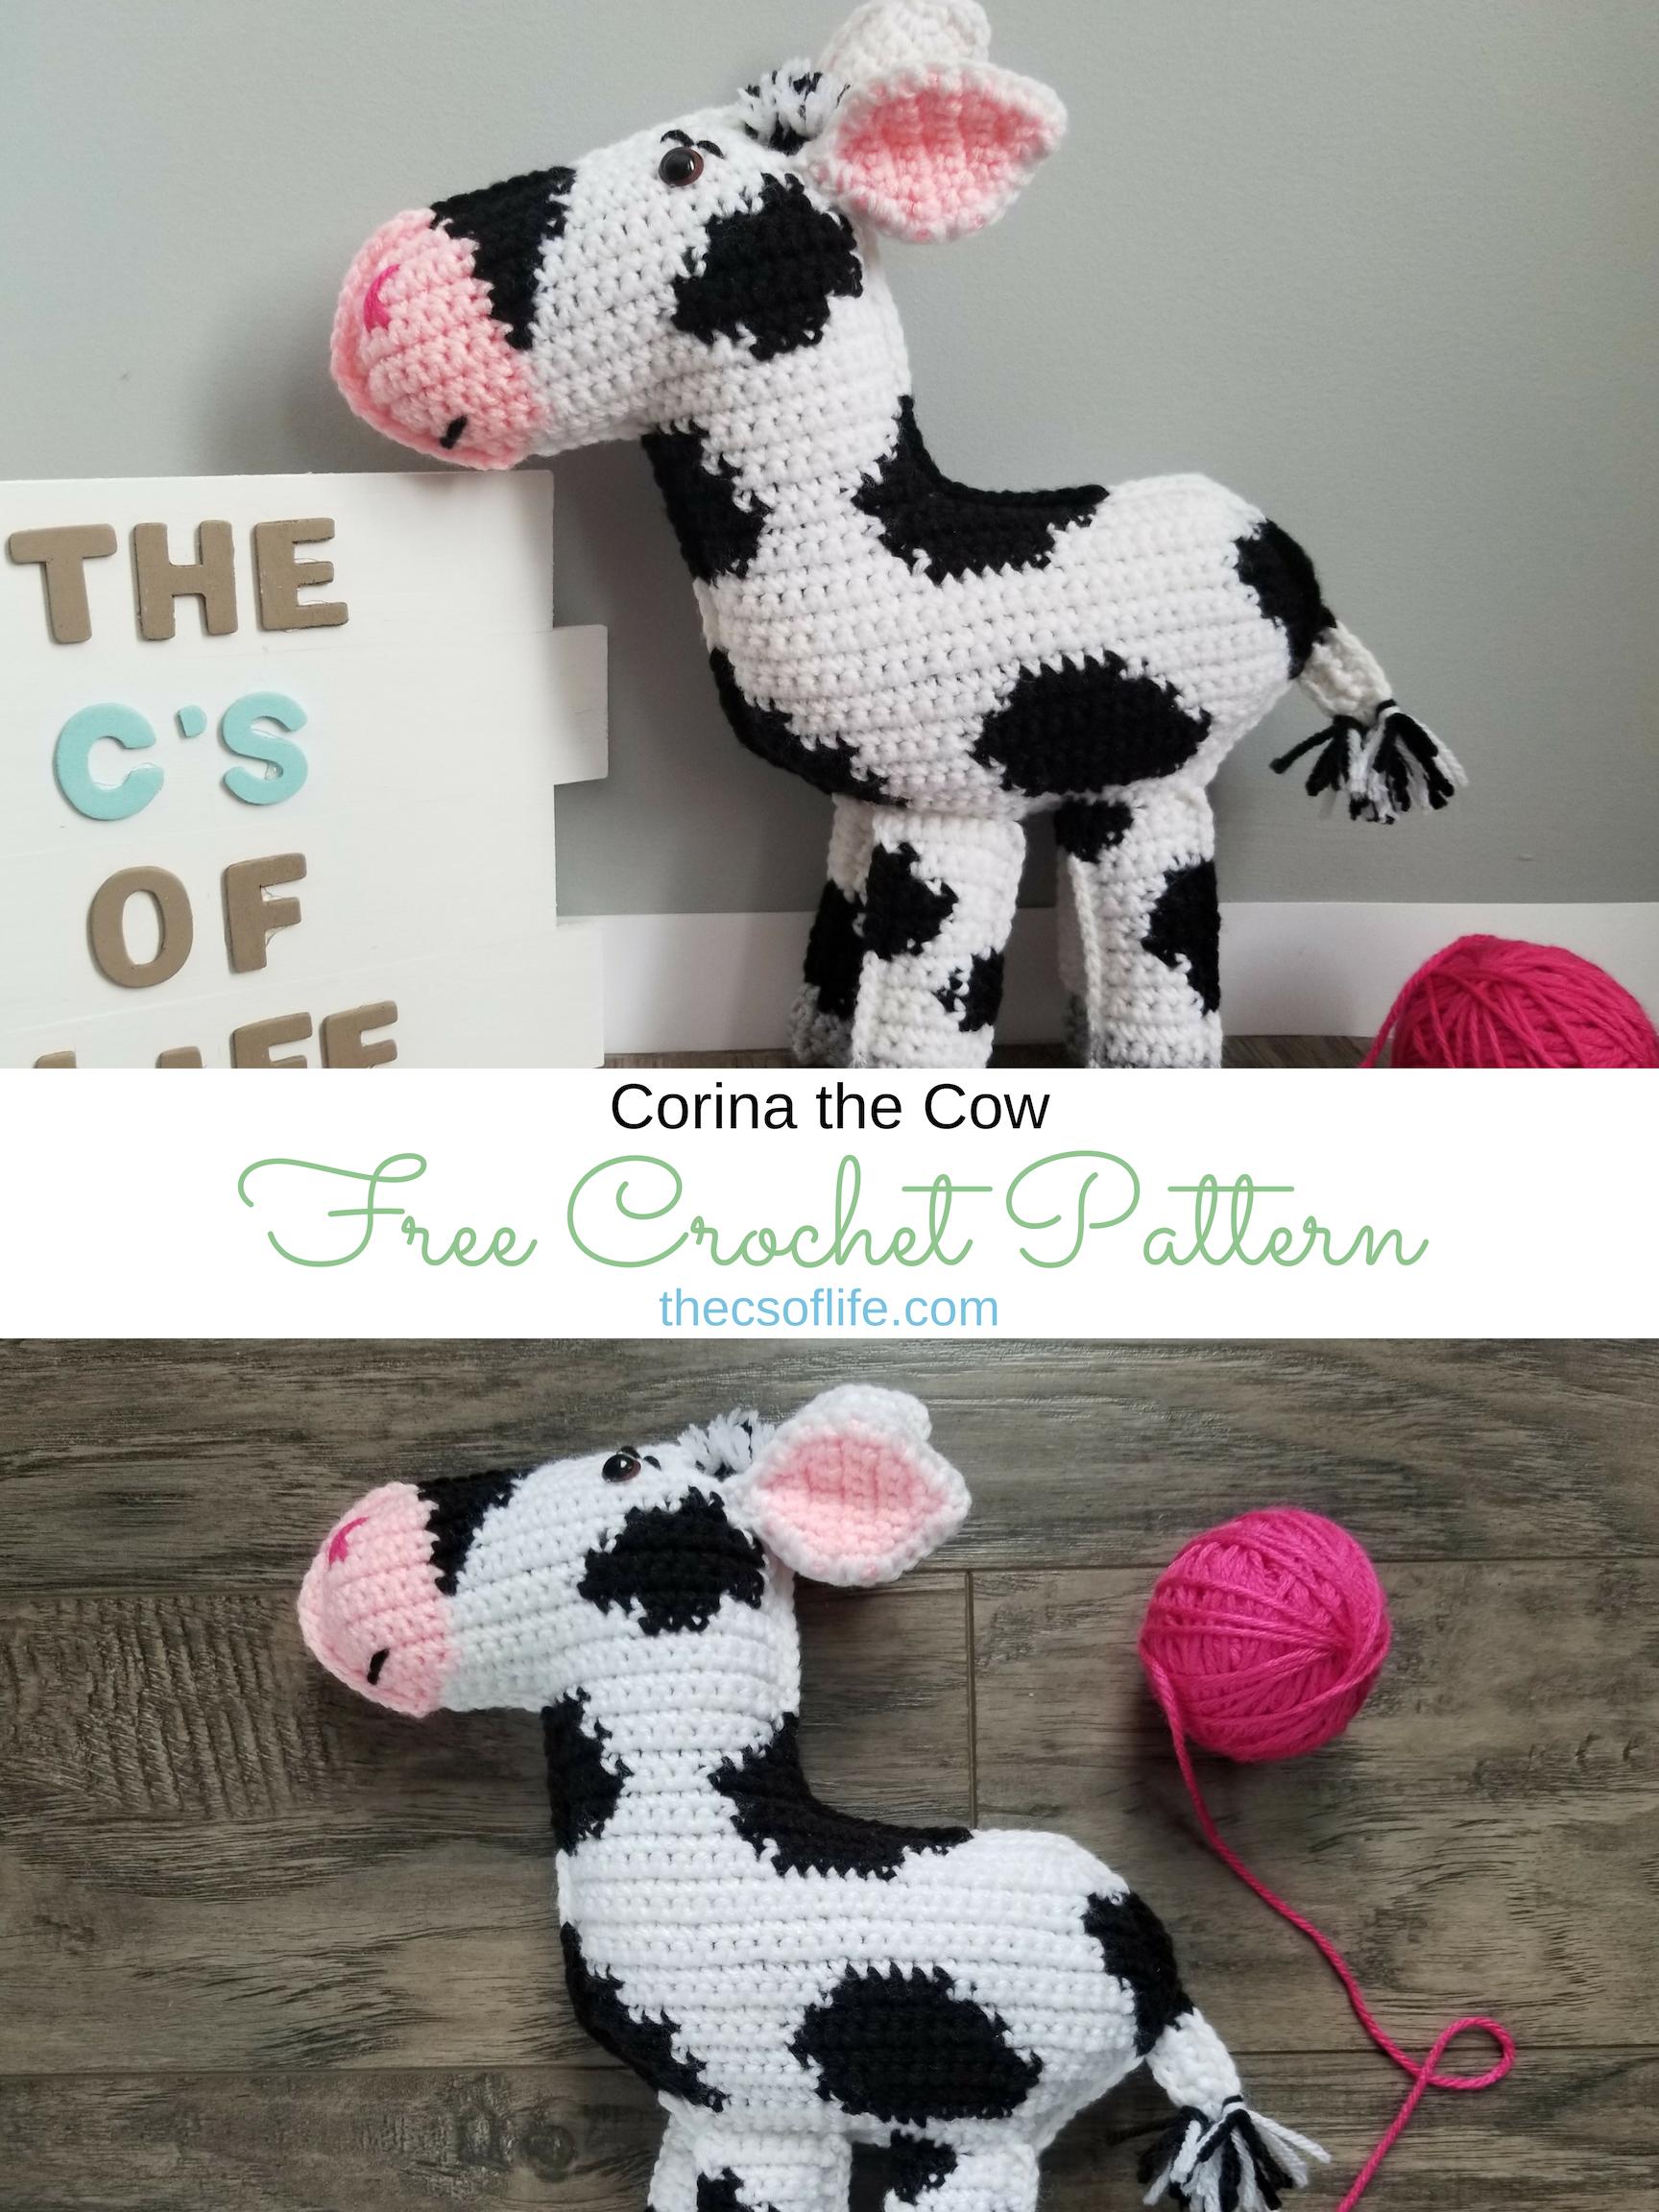 Corina the Cow - Free Crochet Pattern